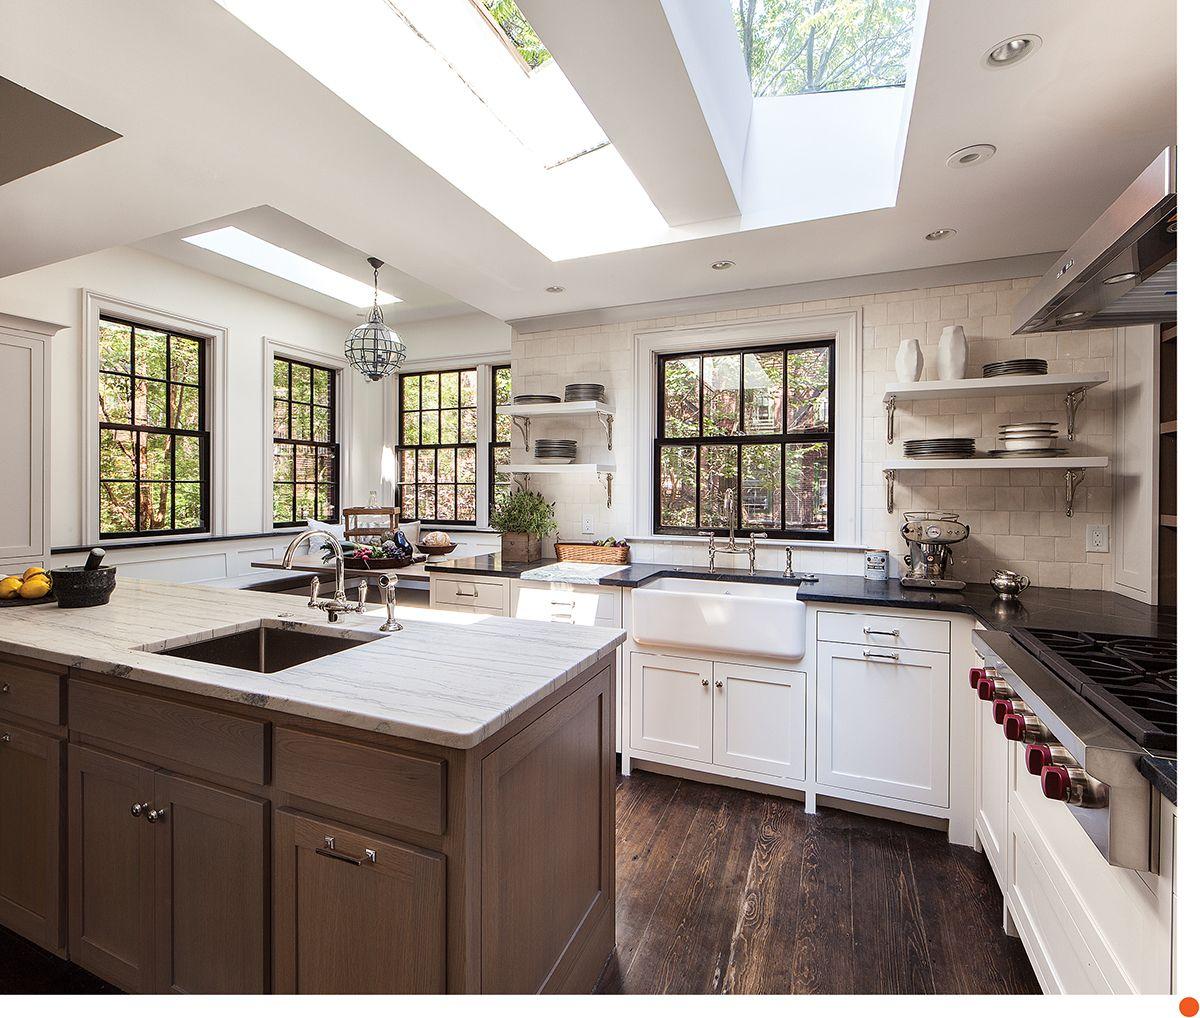 Uncategorized Kitchen Design Boston kitchens guide 2016 kitchen designskitchen remodelhome ideasbostonvictorian